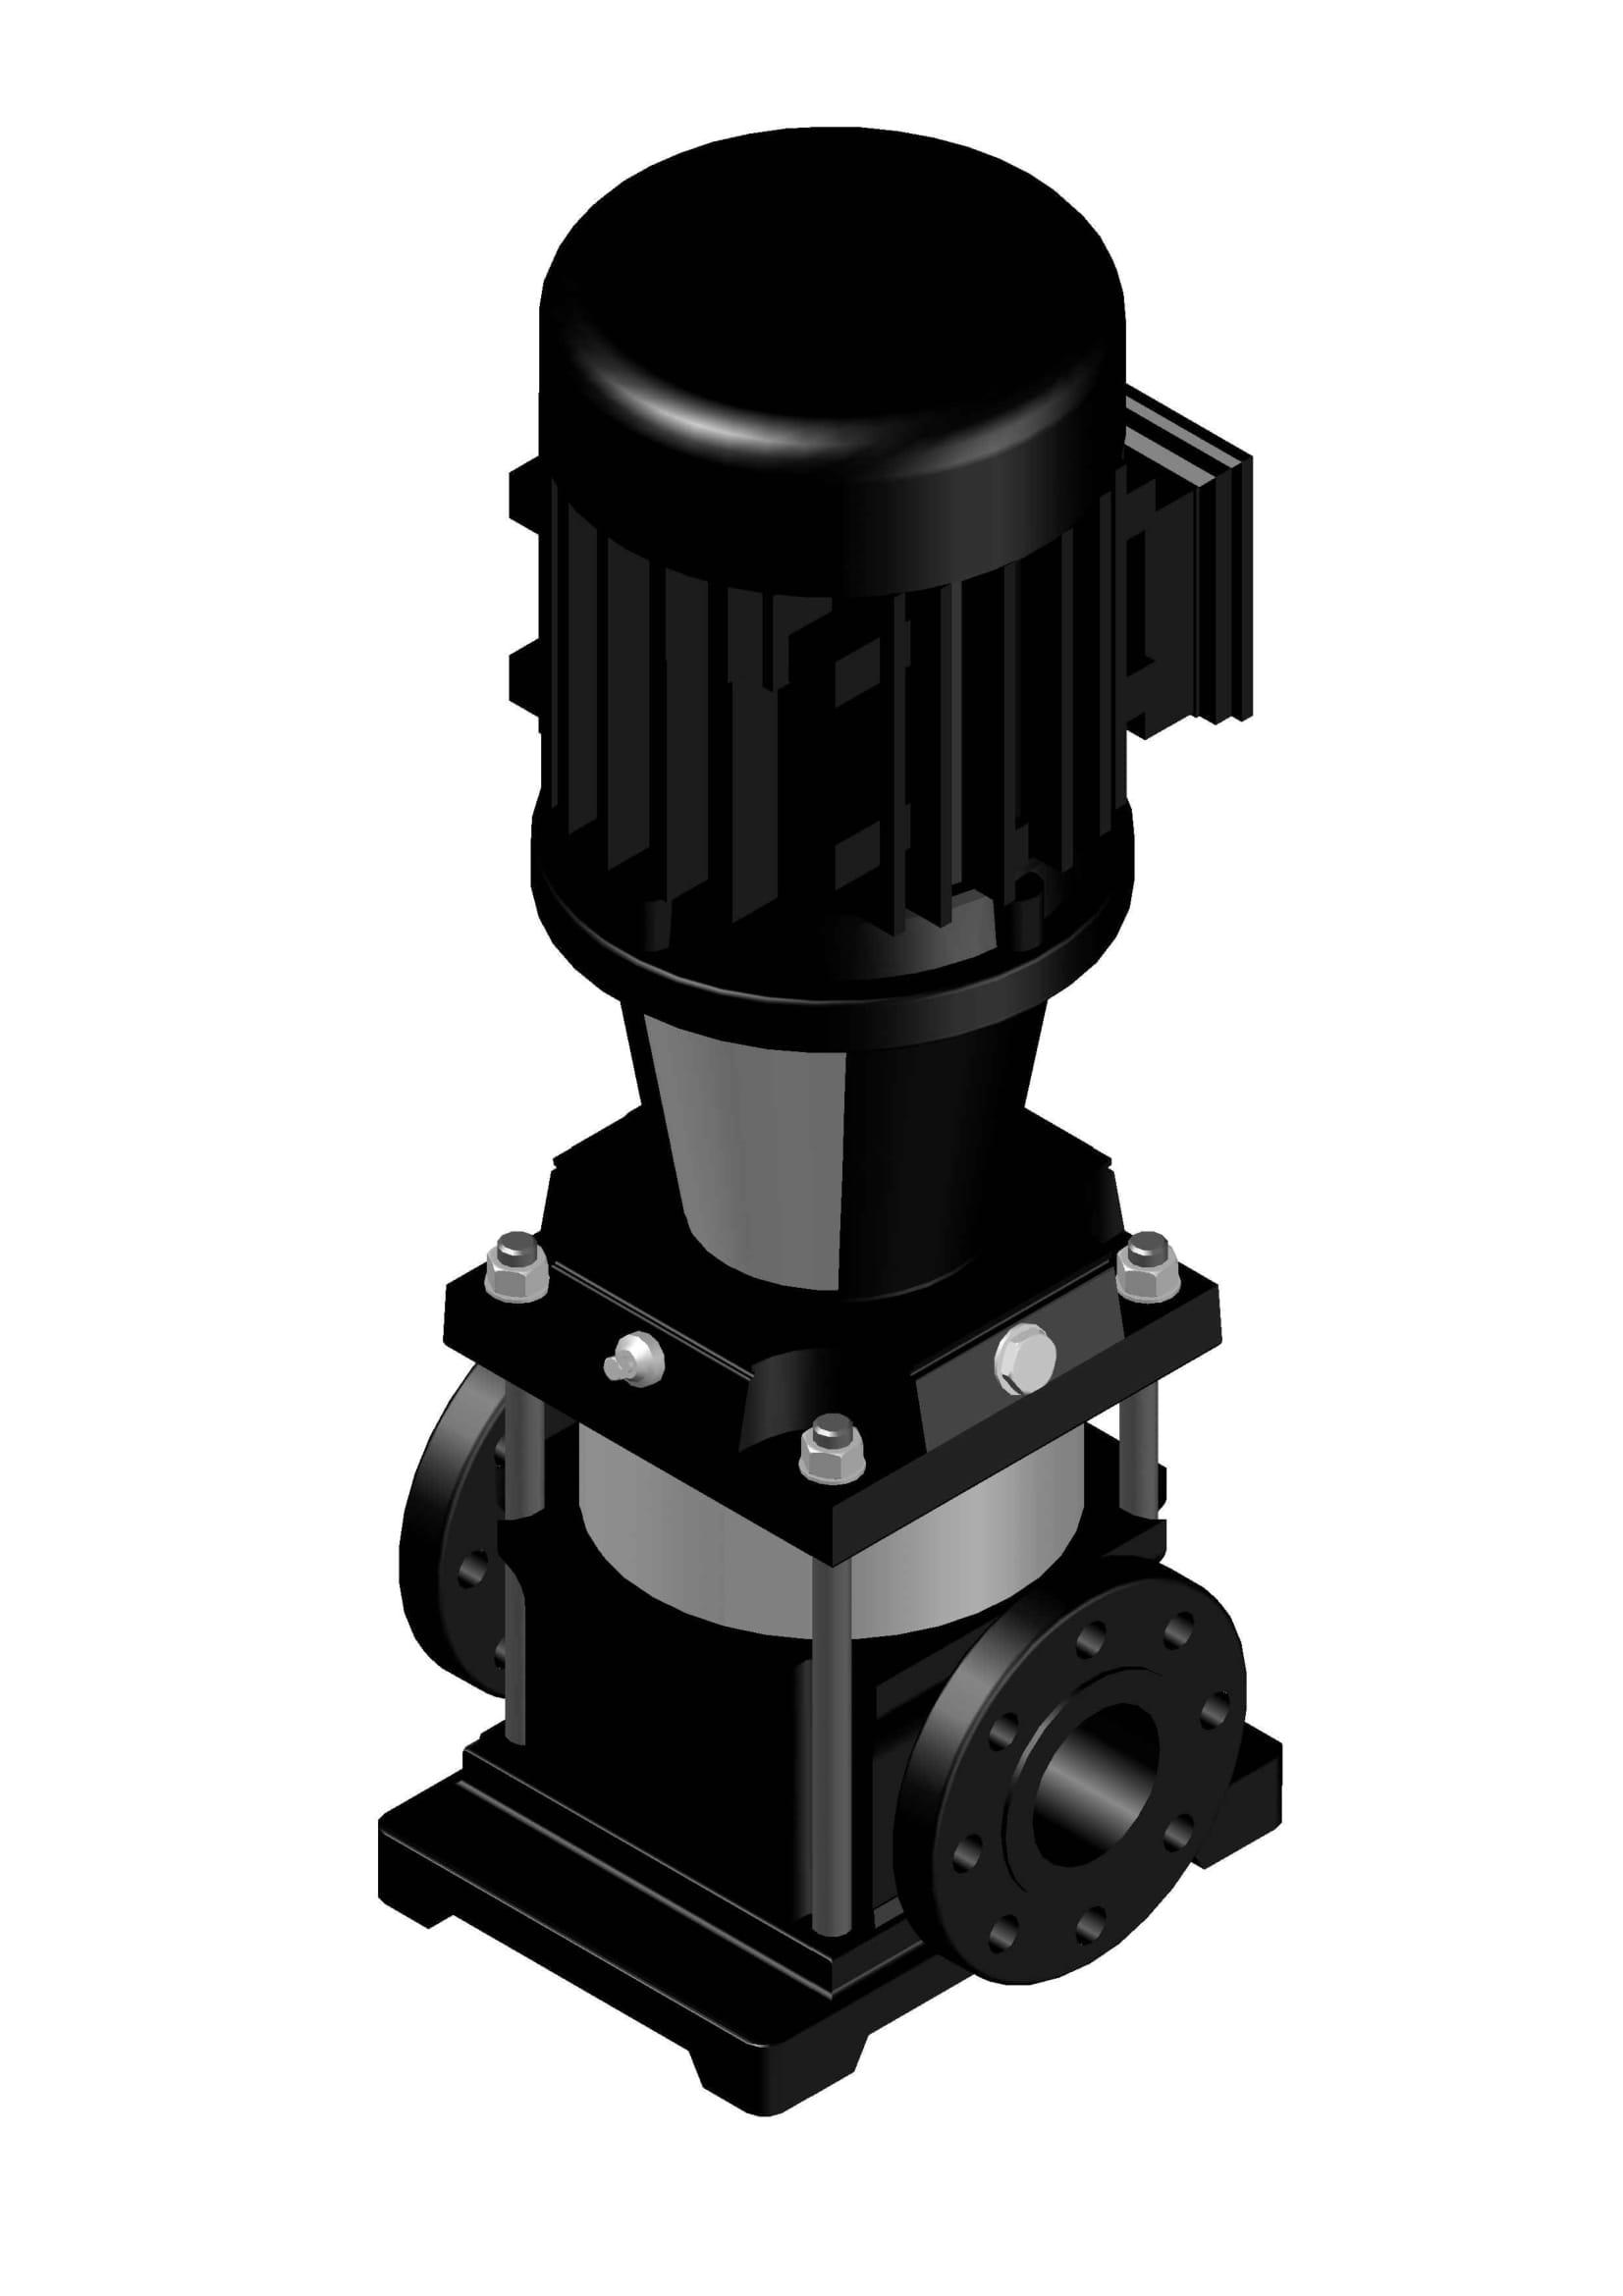 BV 45-01